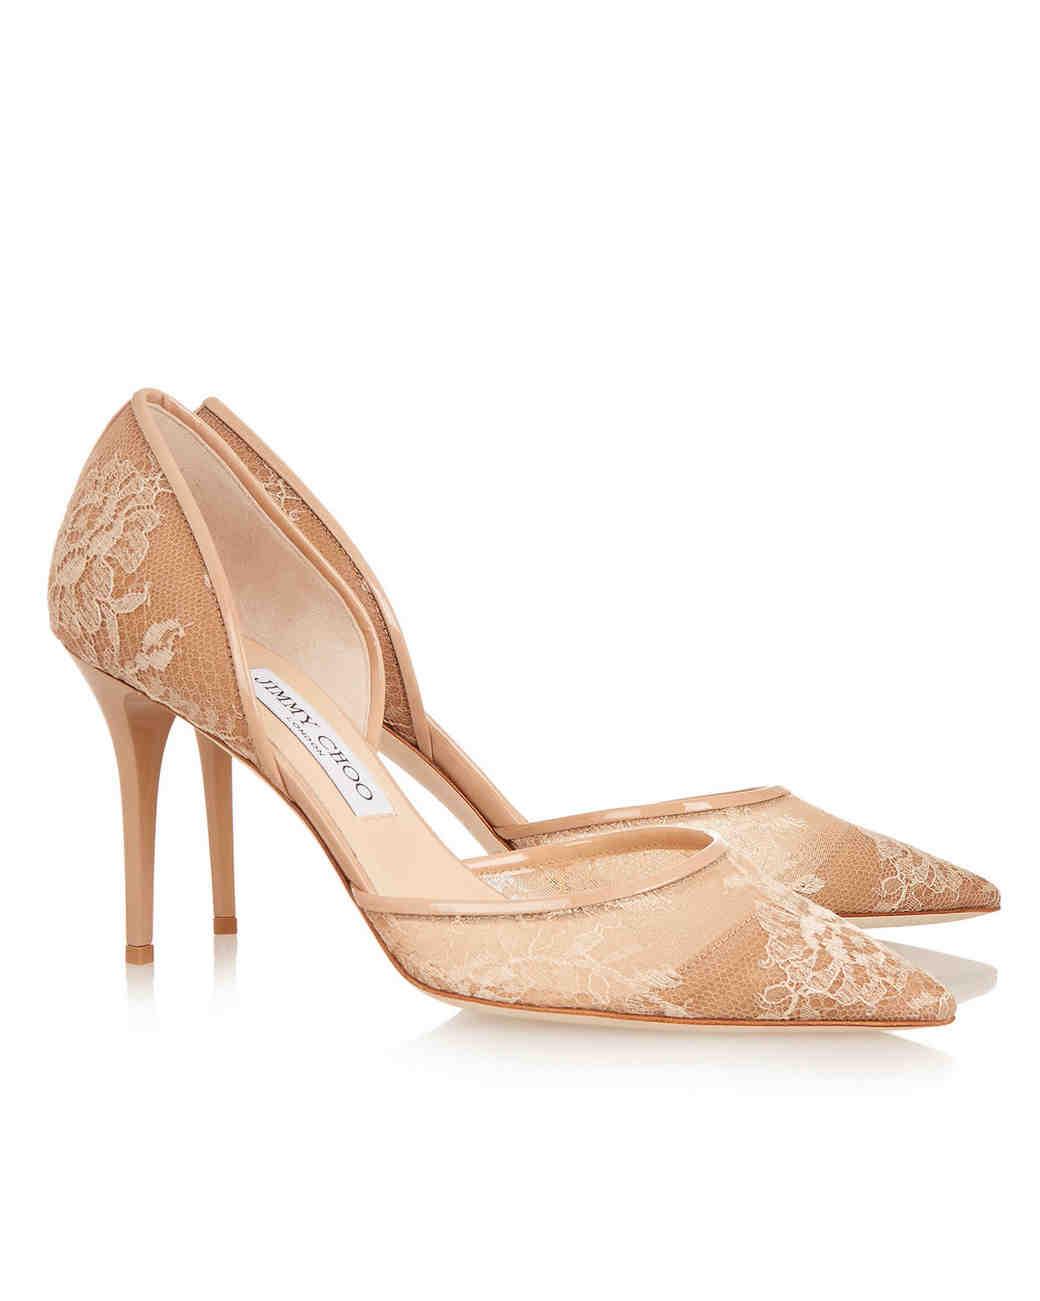 closed-toe-wedding-shoes-jimmy-choo-1215.jpg